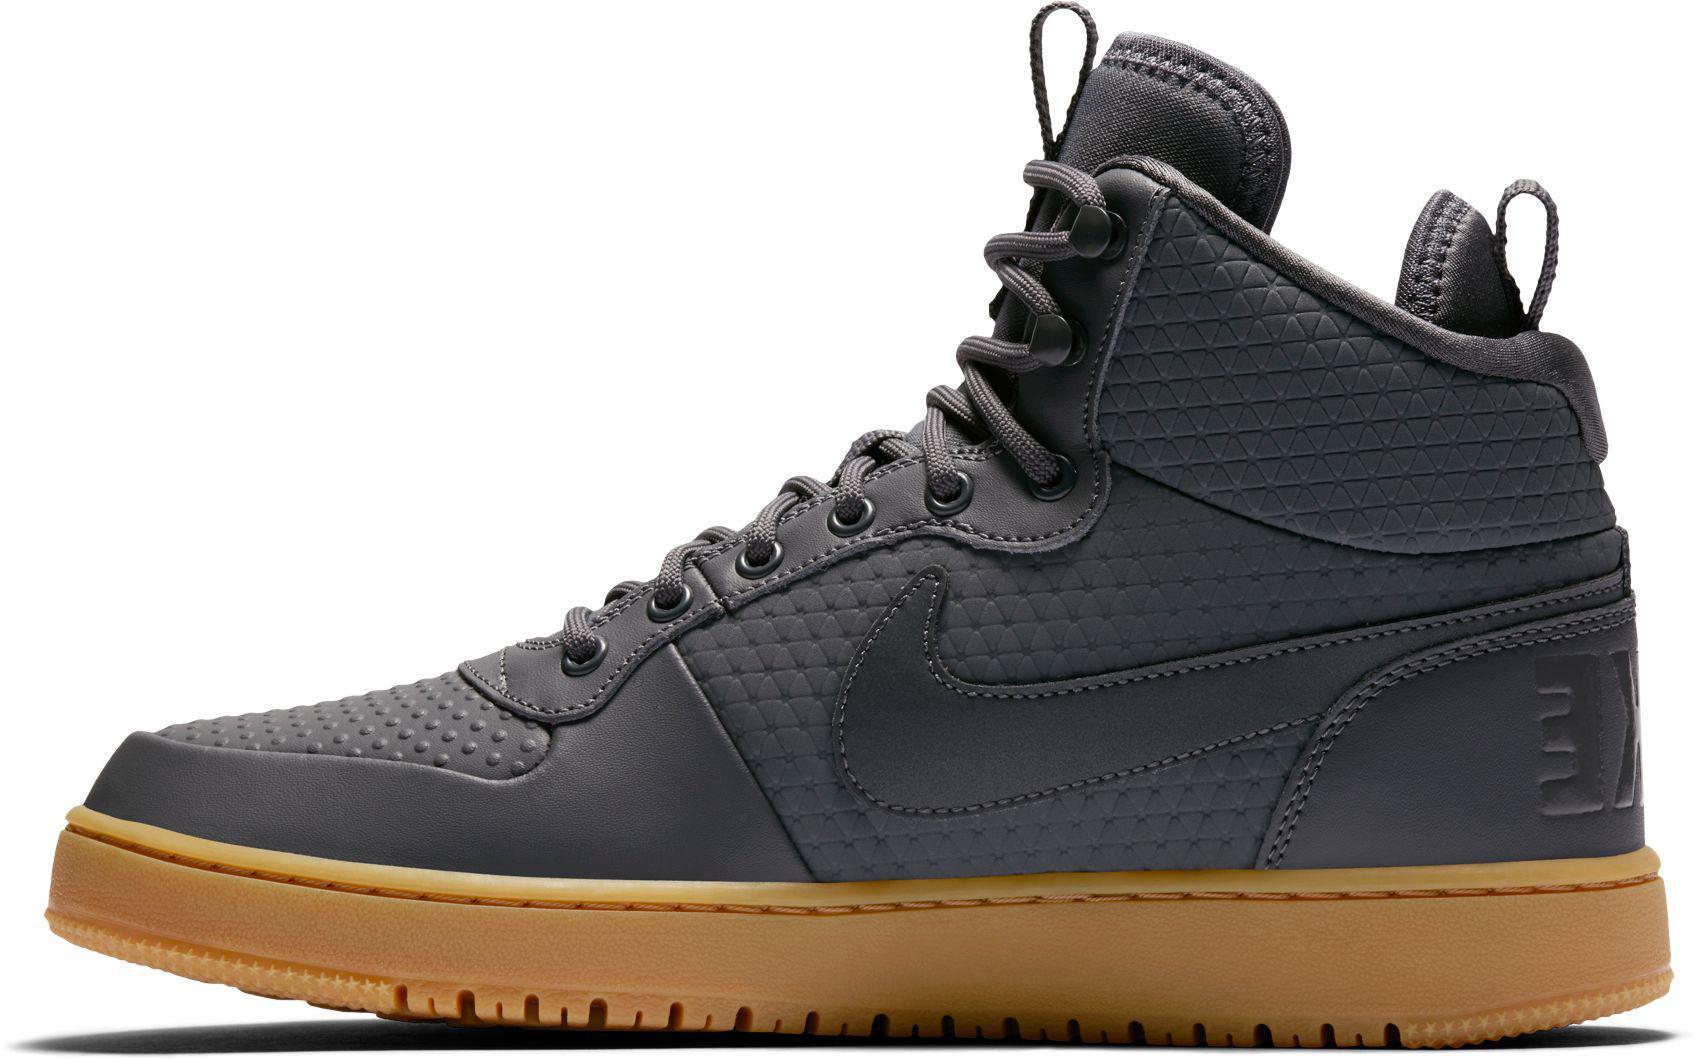 Nike Men's Court Borough Mid Winter Basketball Shoes